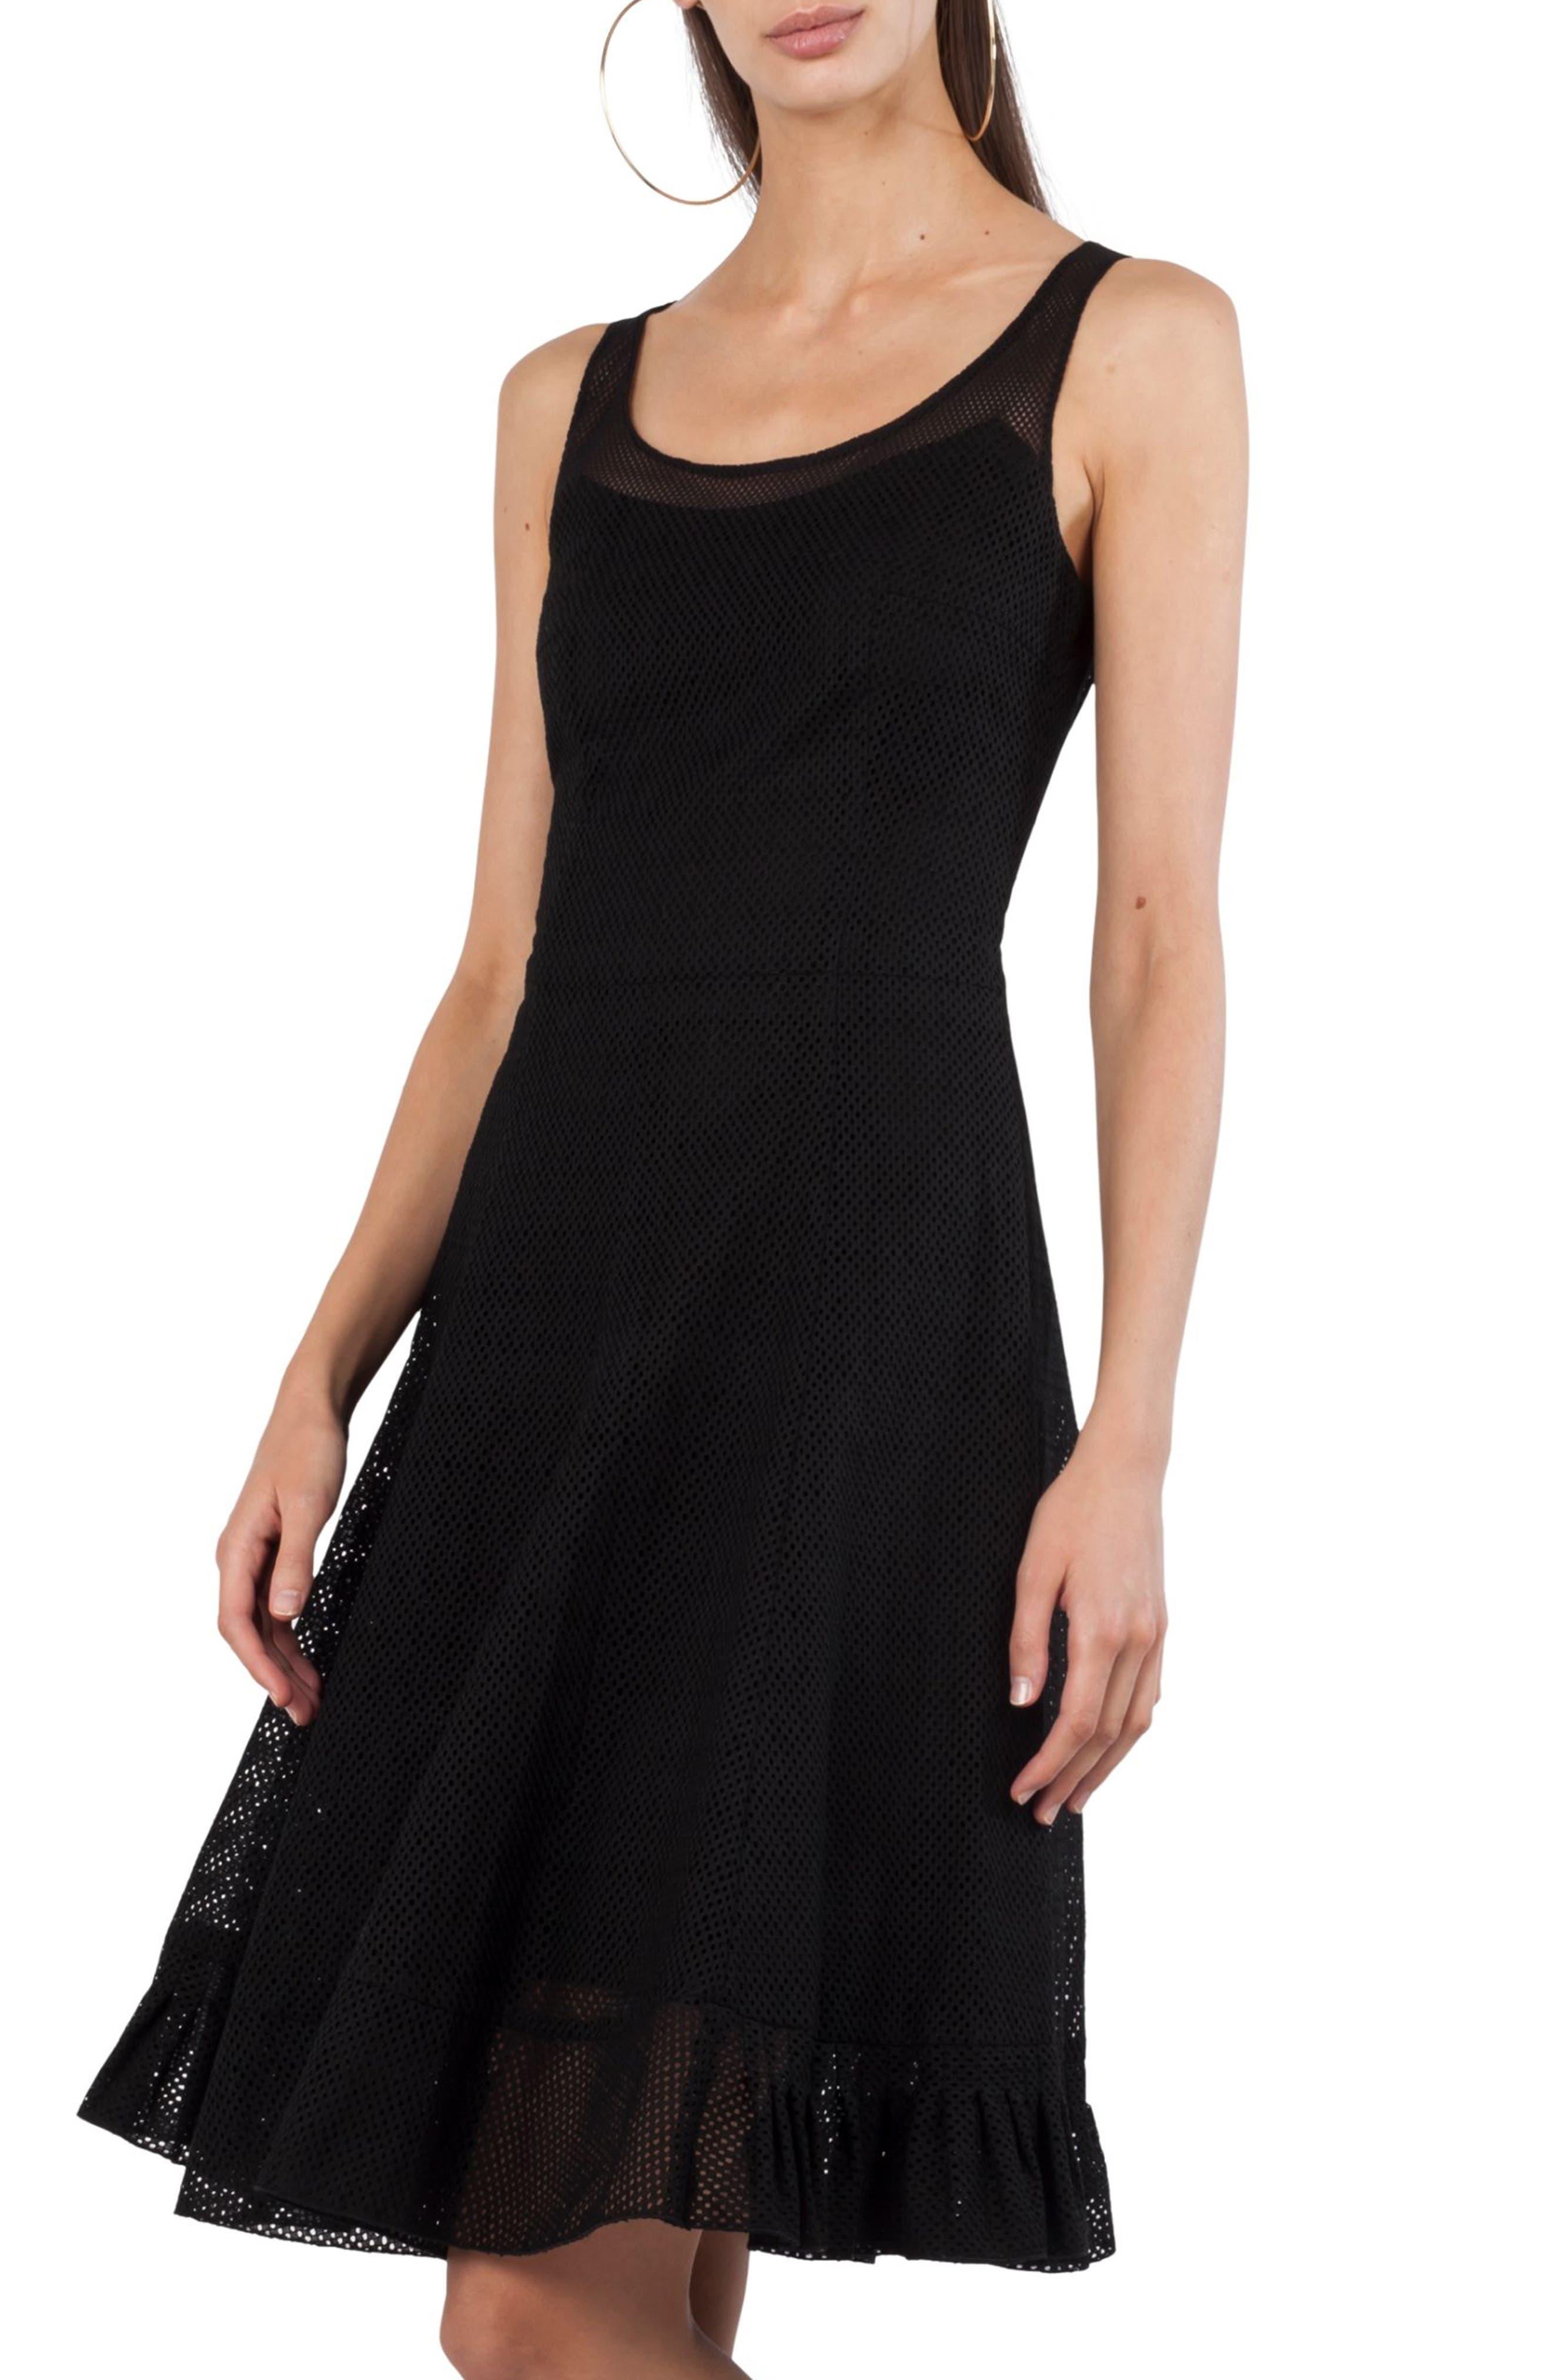 Perforated Tank Dress,                             Main thumbnail 1, color,                             Black